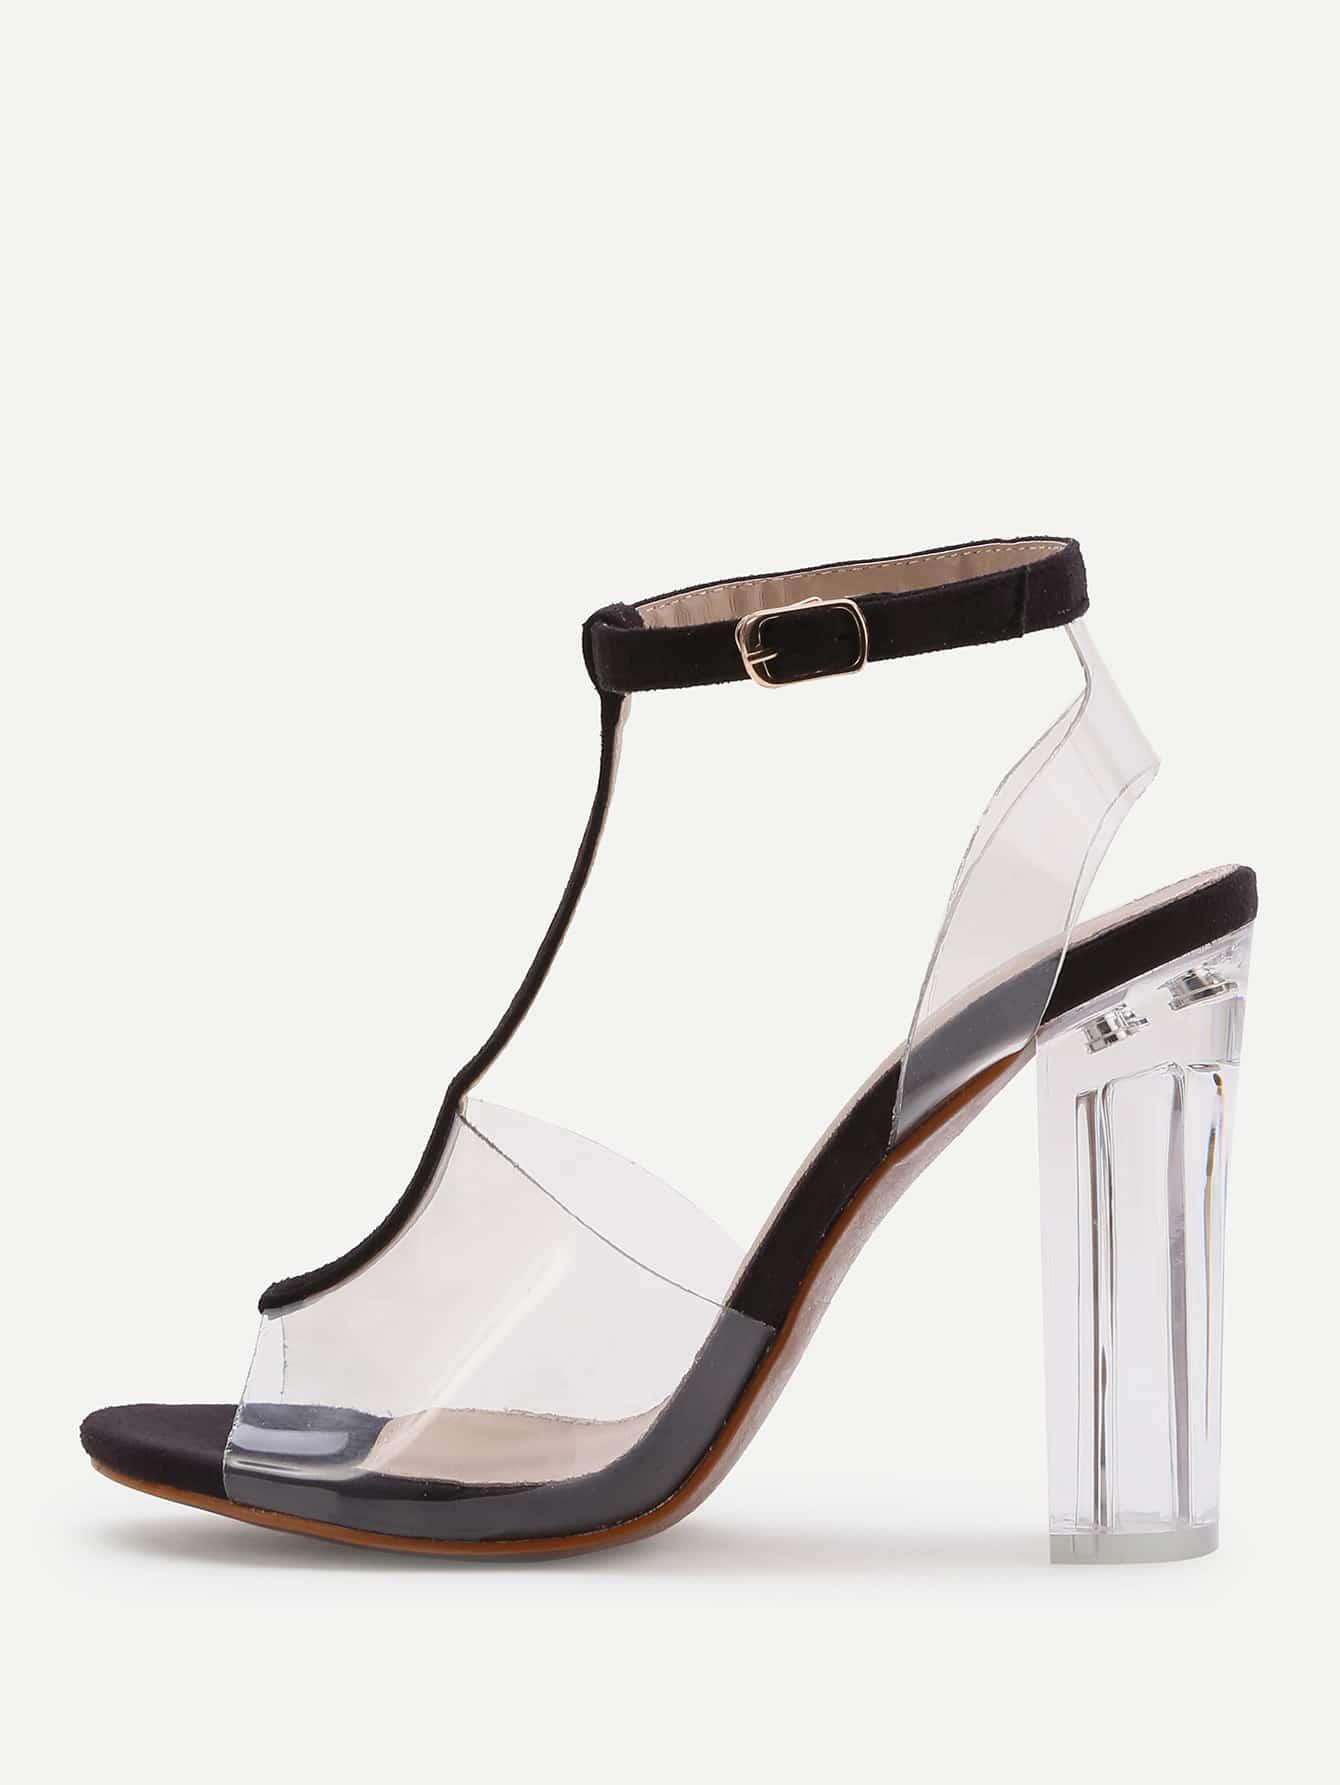 Фото Contrast Ankle Strap Peep Toe Clear Chunky Heels. Купить с доставкой